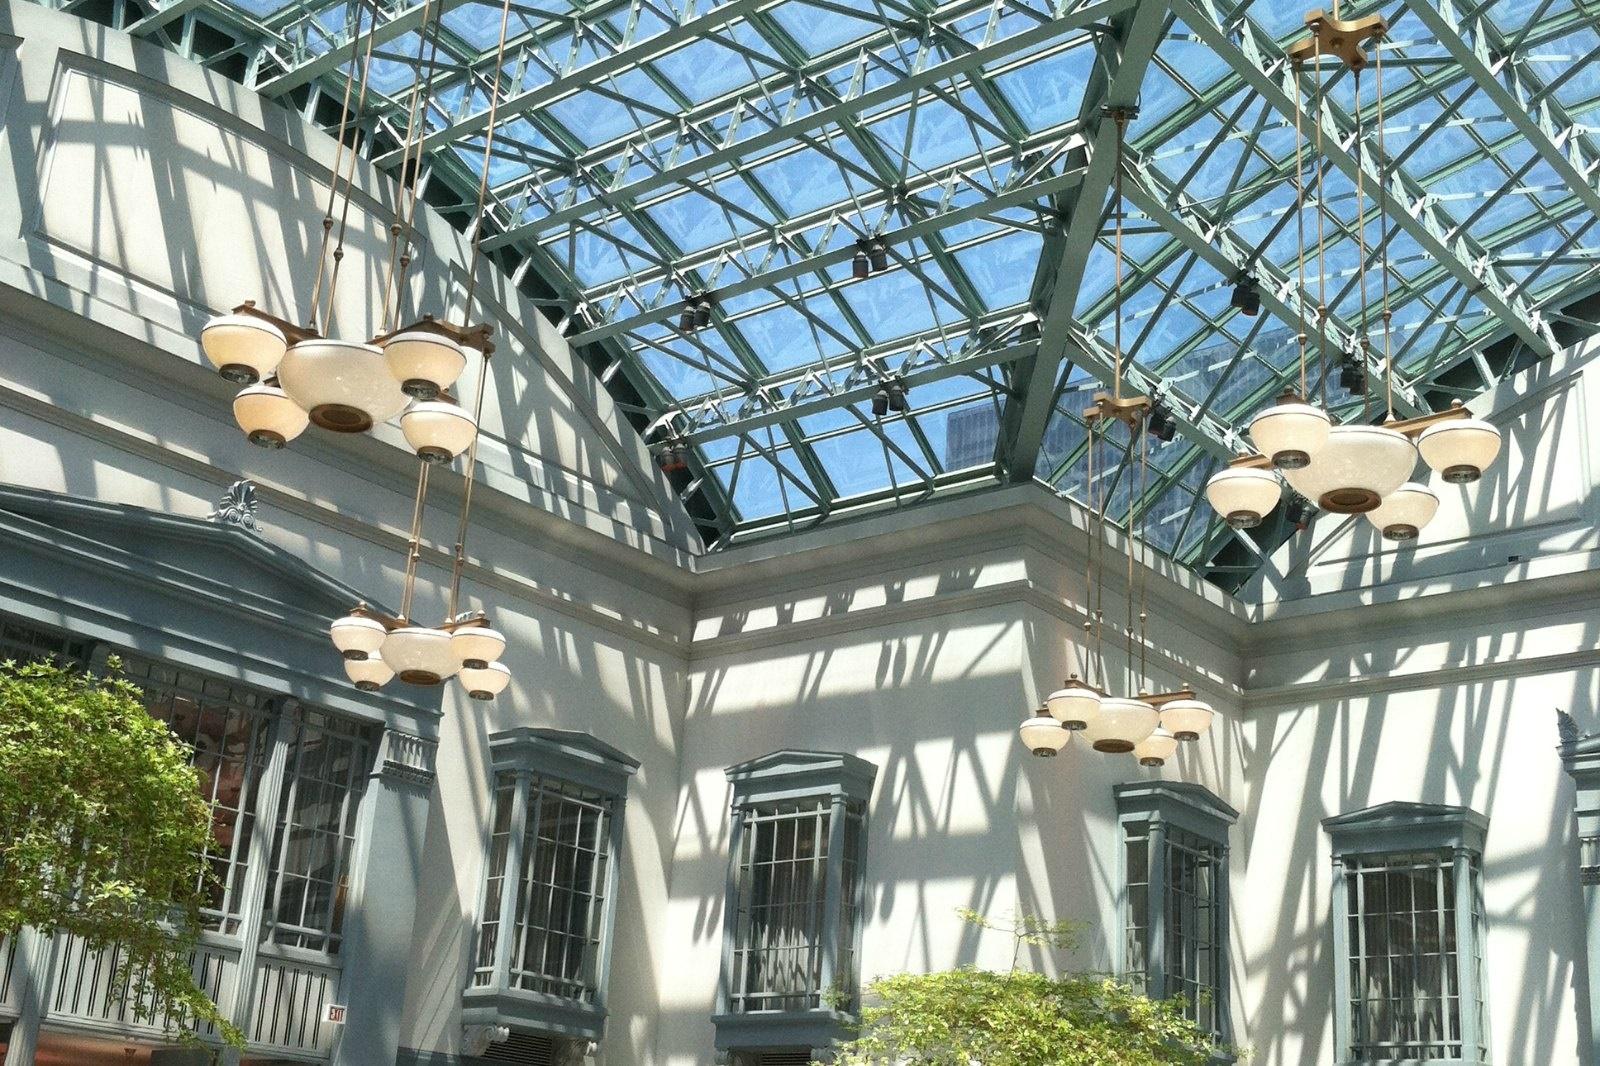 chicago public library harold washington